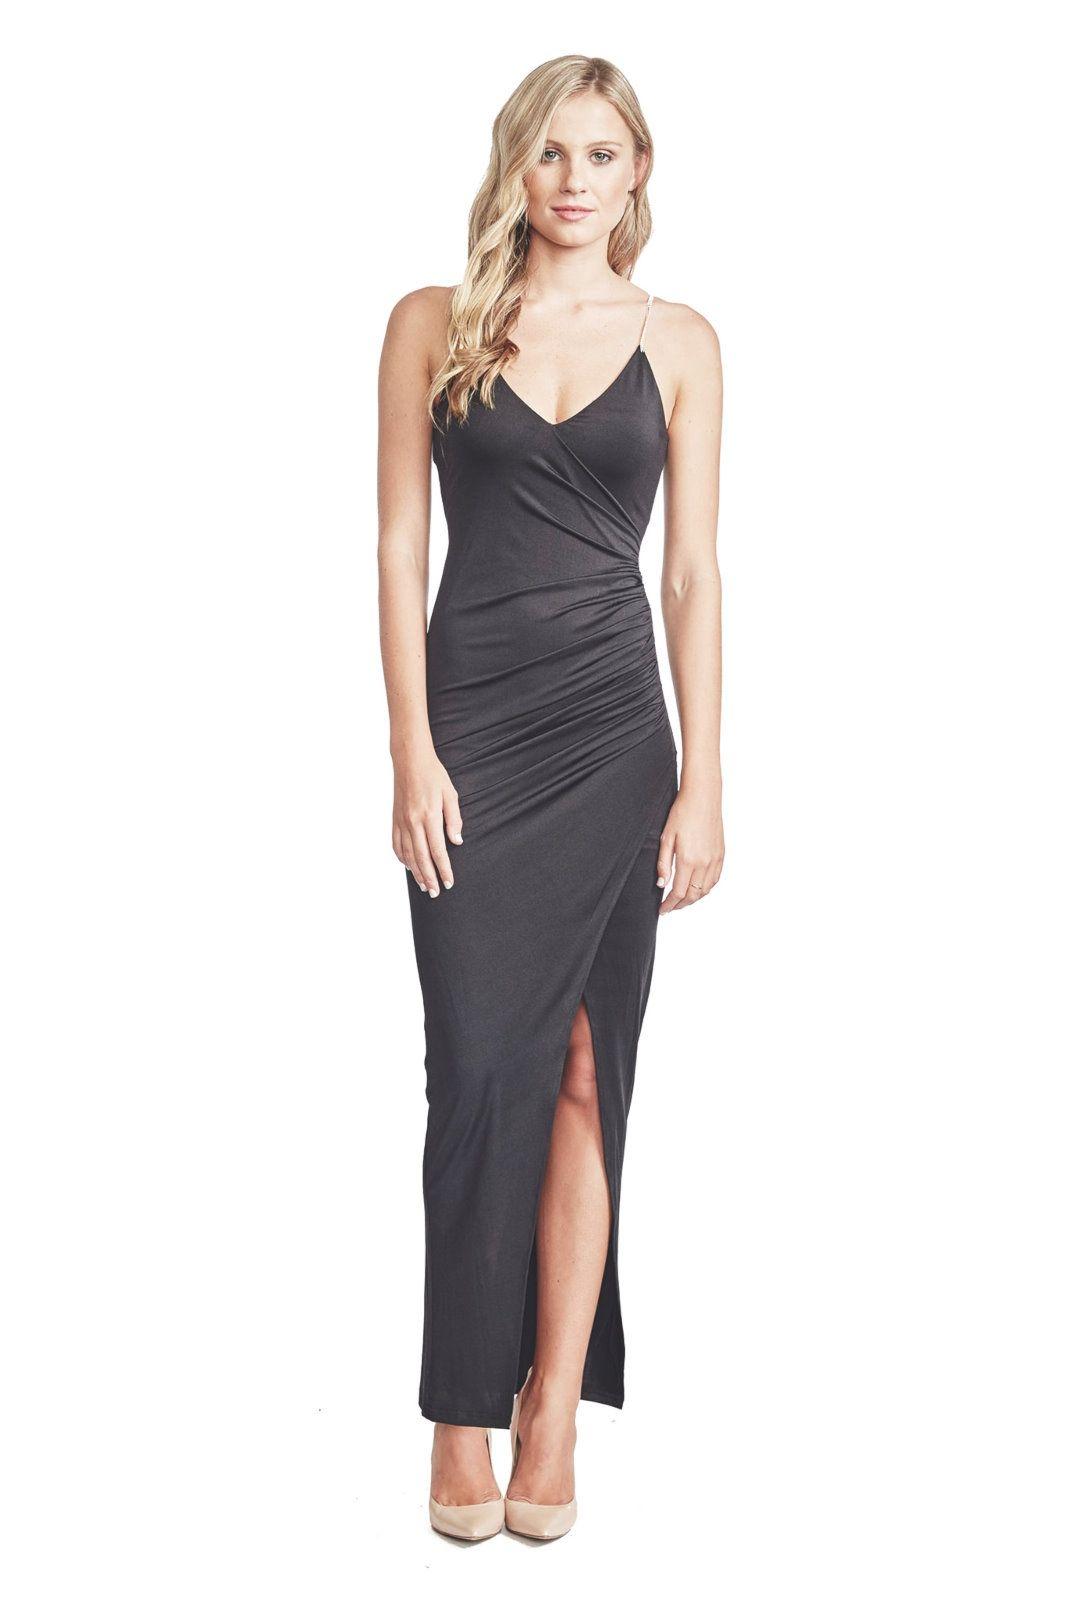 Elle Zeitoune - Willa Dress - Black - Front